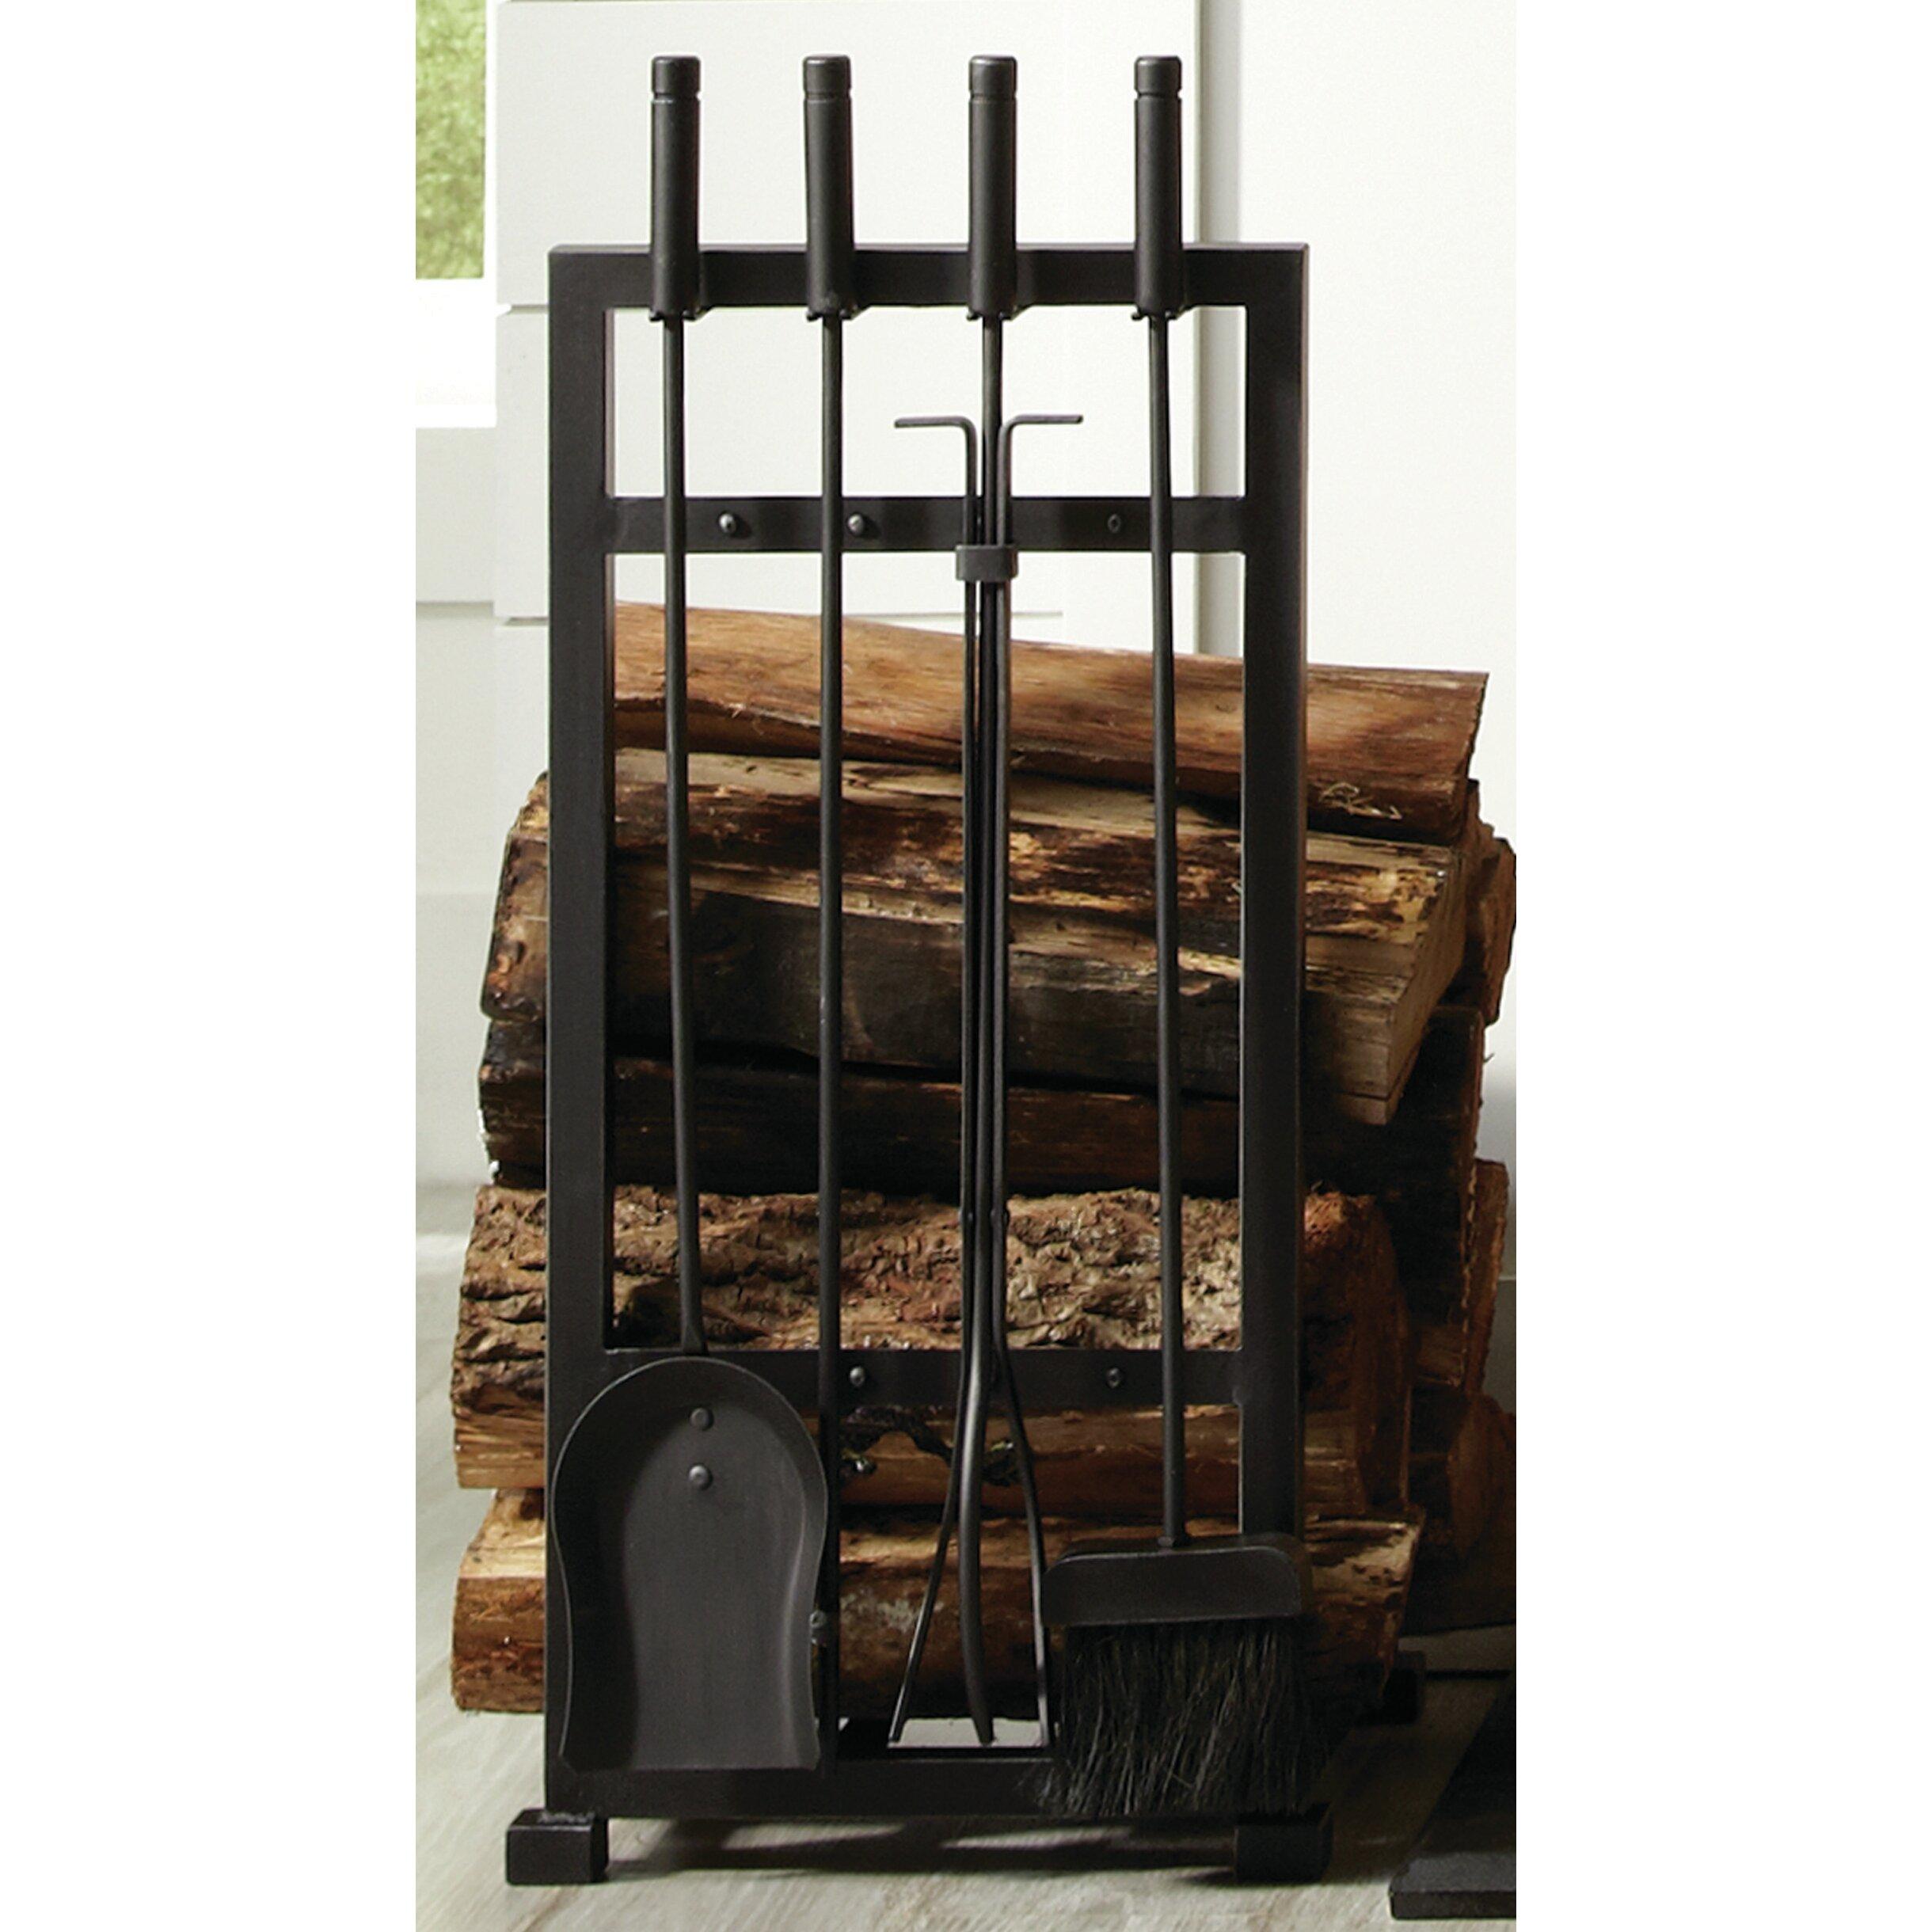 cast iron fire grate fireside log basket fireplace holder by home - Fireplace Log Holder